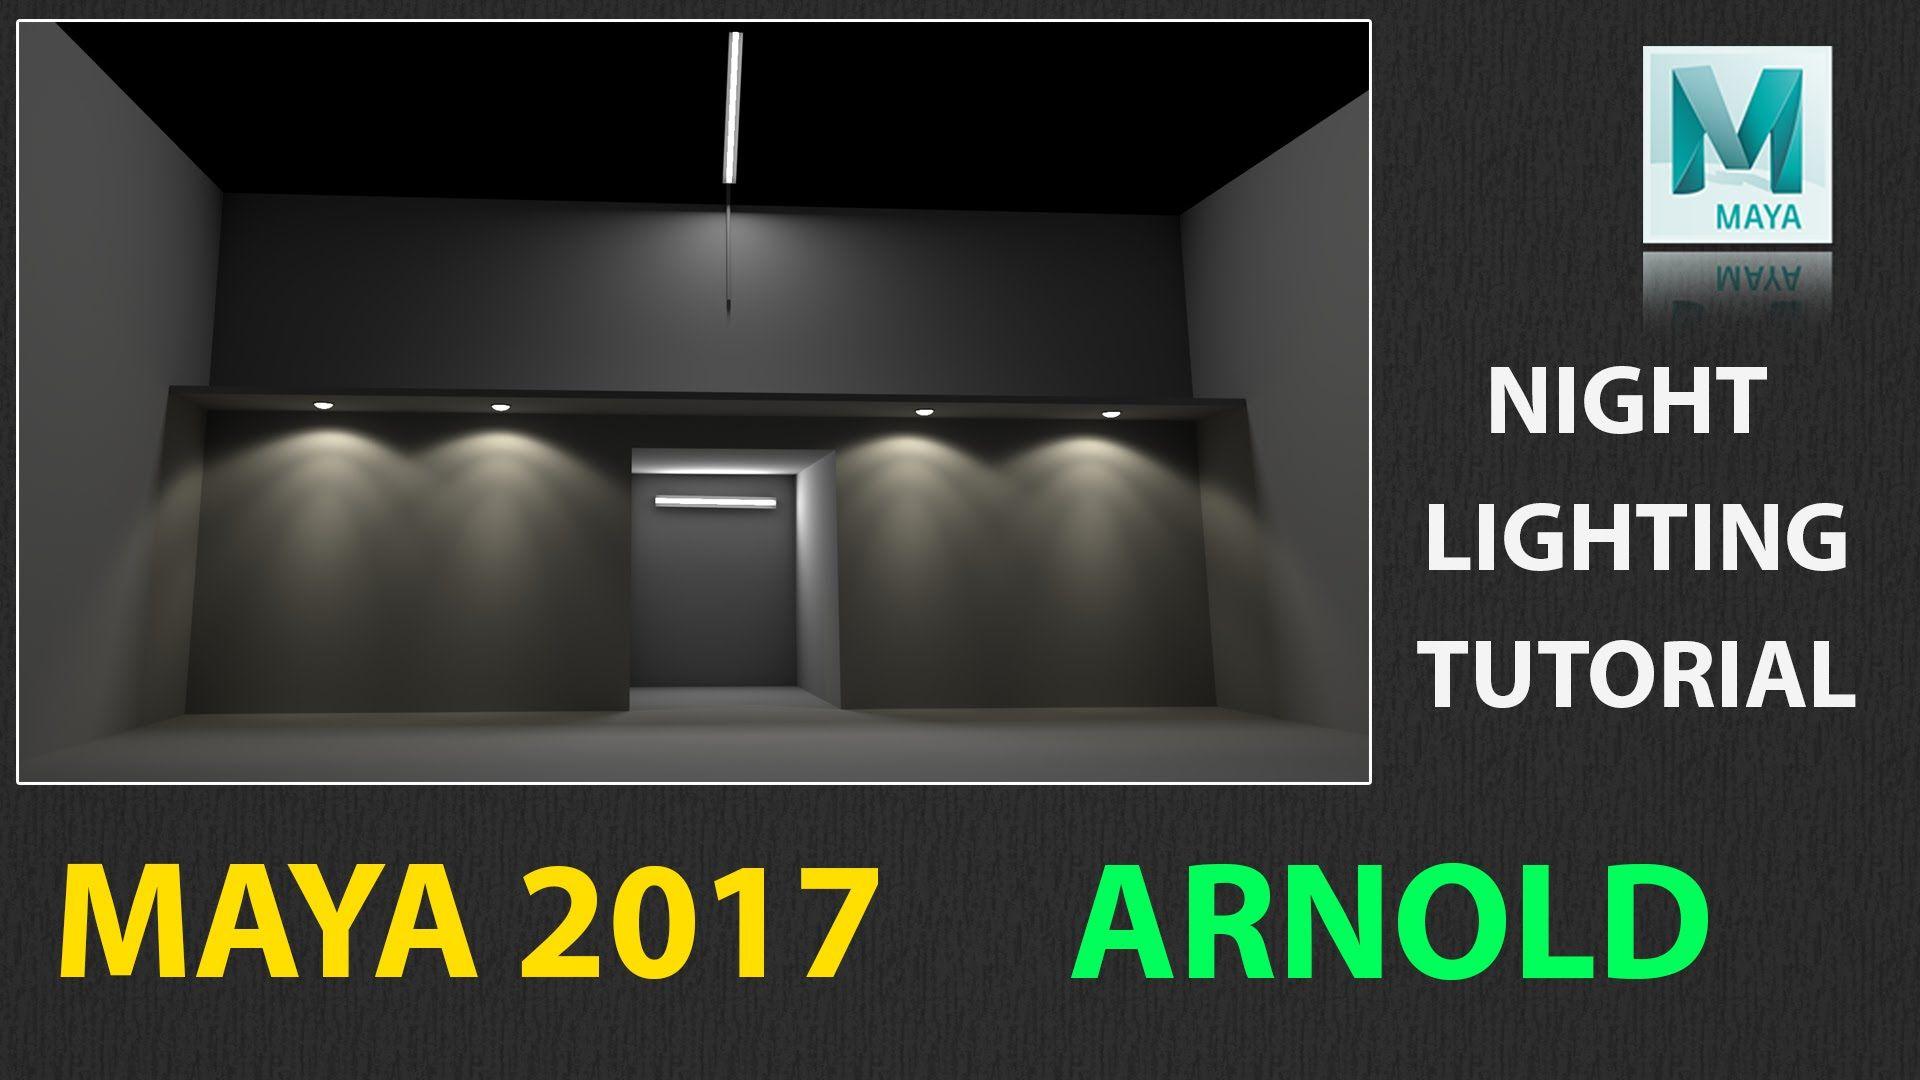 Maya 2017 Night Lighting Tutorial Using ARNOLD Please